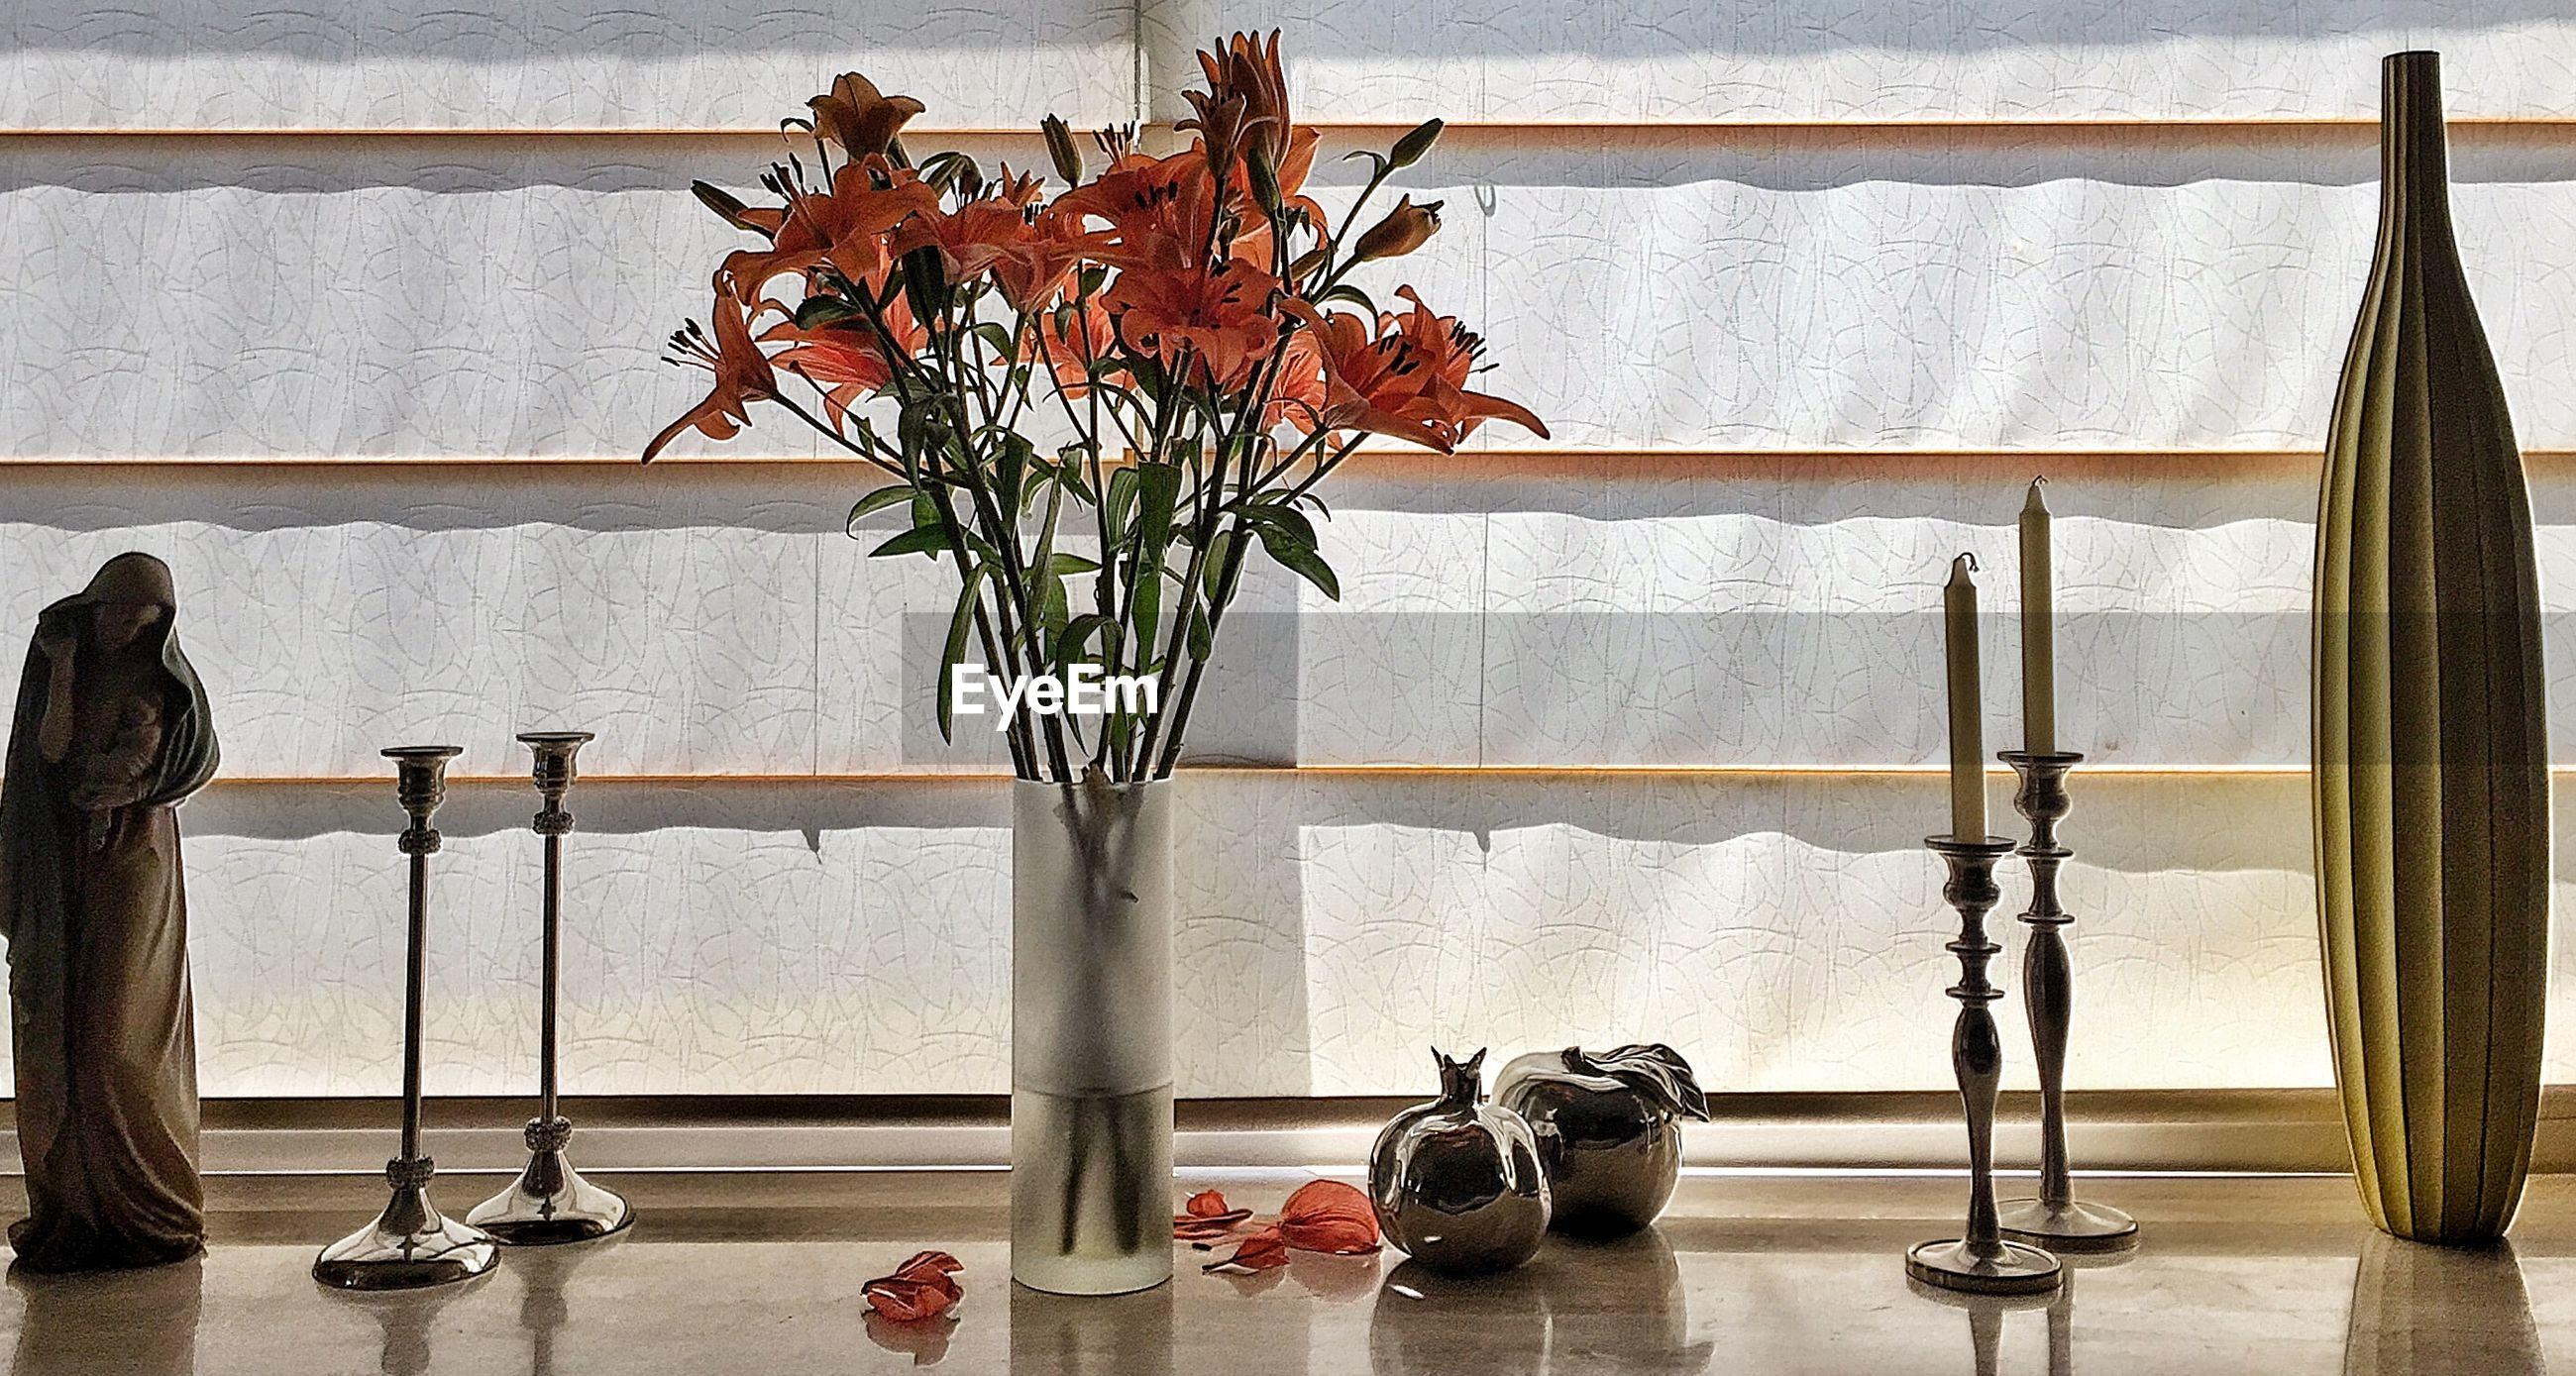 Flower vase amidst candlestick holder on table